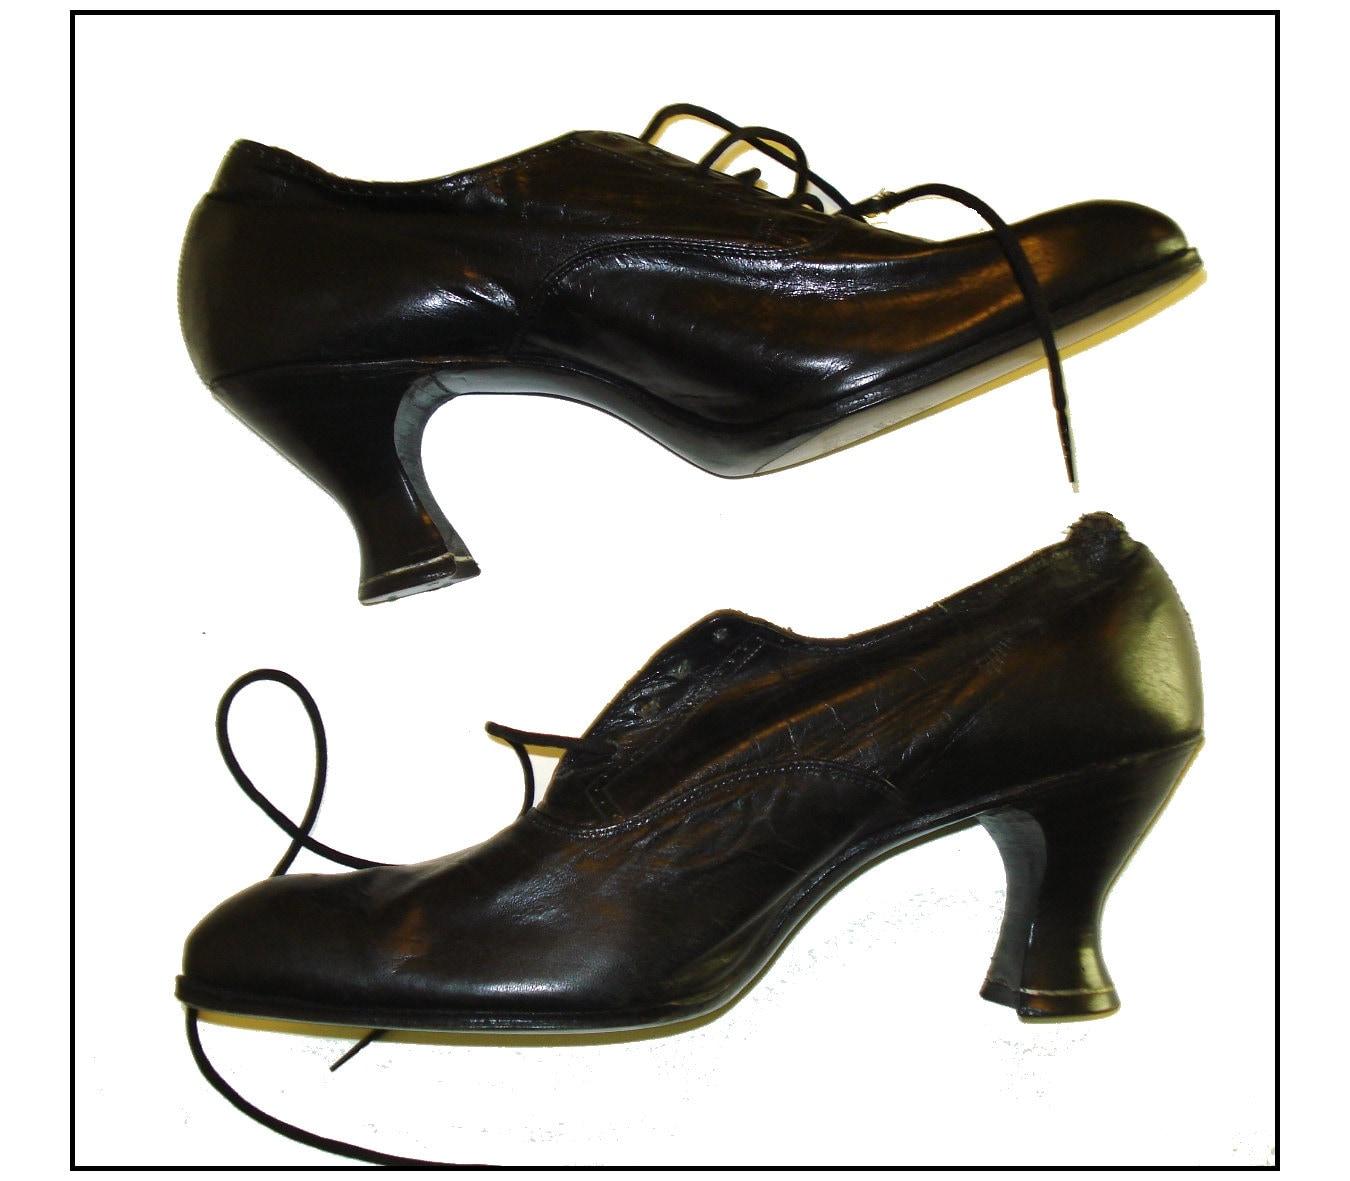 Authenic 1800s Shoes Boots Nos Victorian Edwardian Lace Up